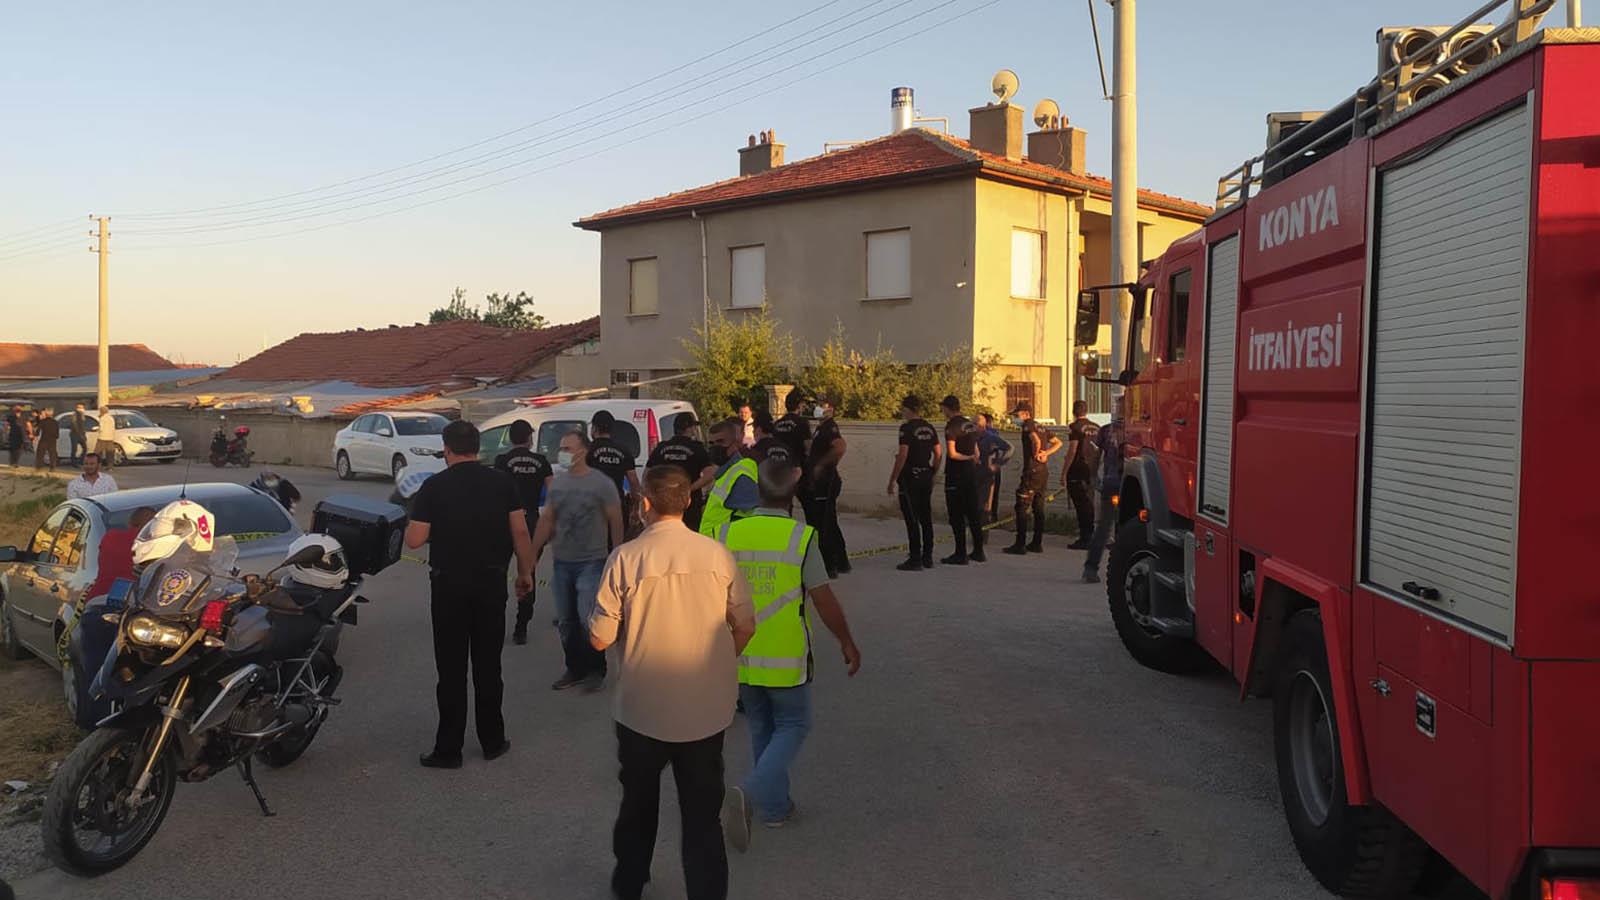 Photo of Թուրքական Քոնիայում քուրդ ընտանիքի սպանությունը վախի մթնոլորտ է առաջացրել տեղի քրդերի շրջանում